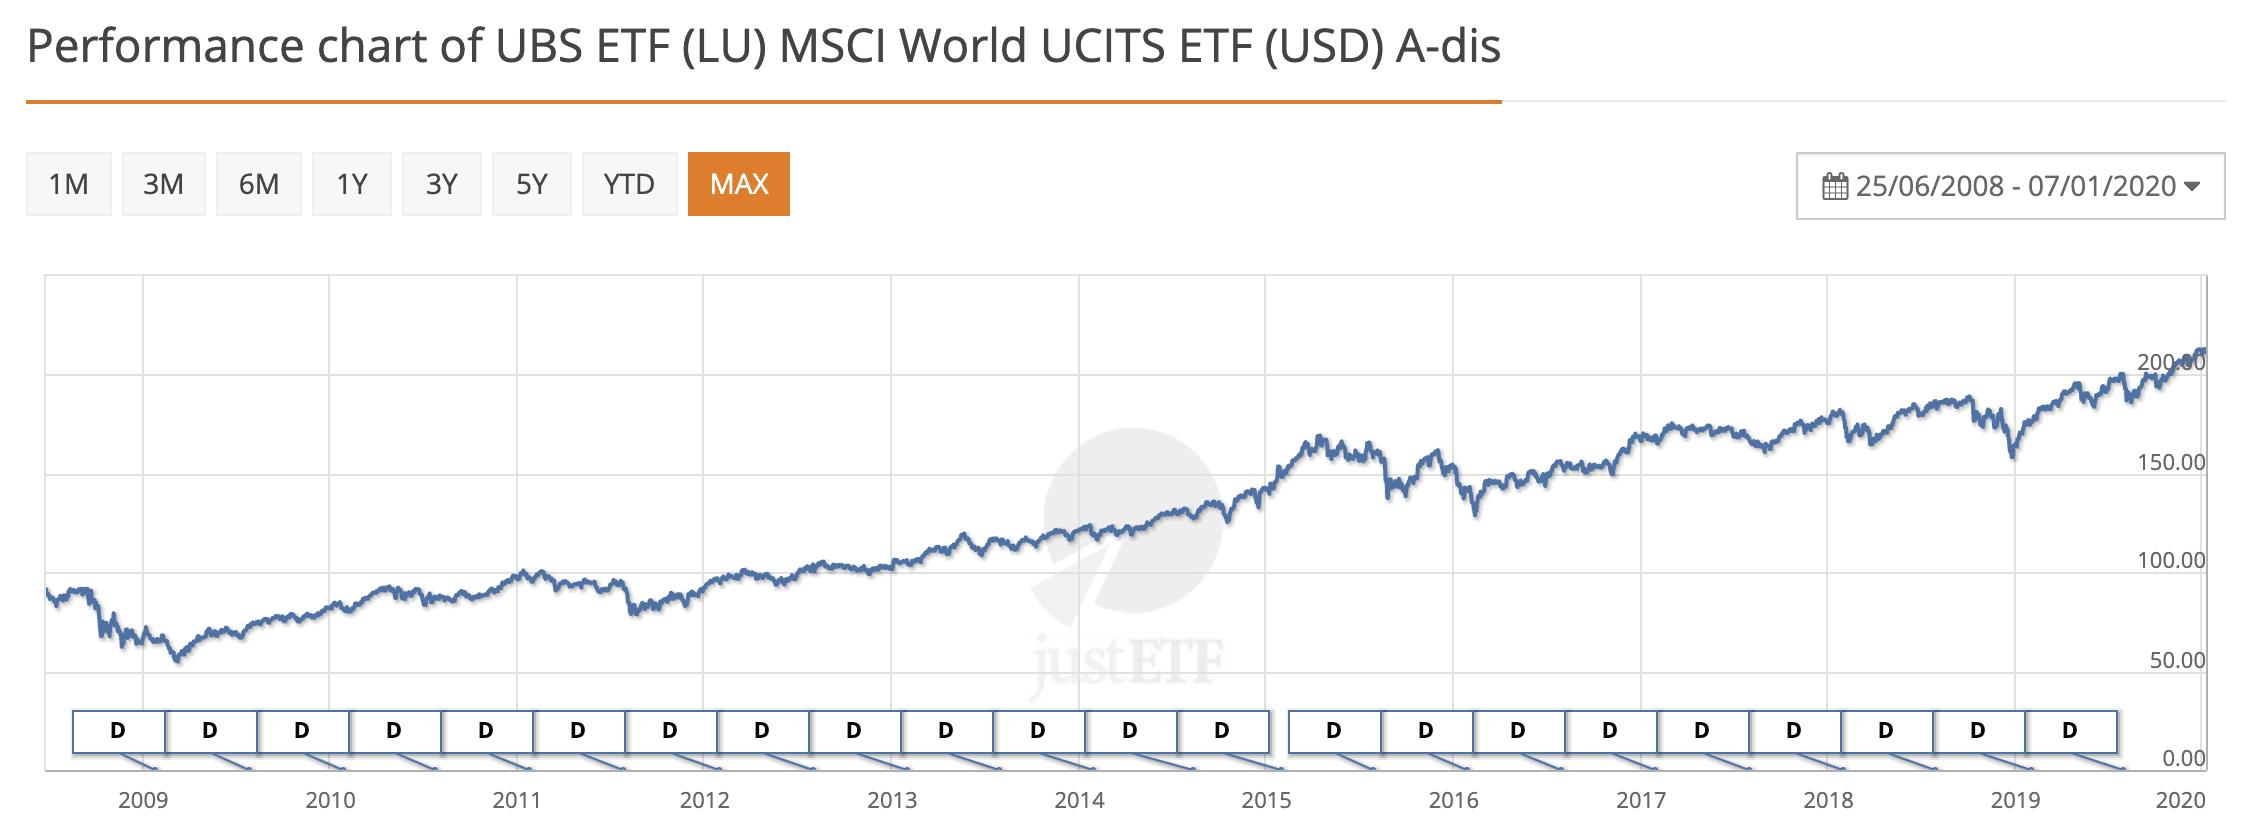 Performance chart of UBS ETF (LU) MSCI World UCITS ETF (USD) A-dis